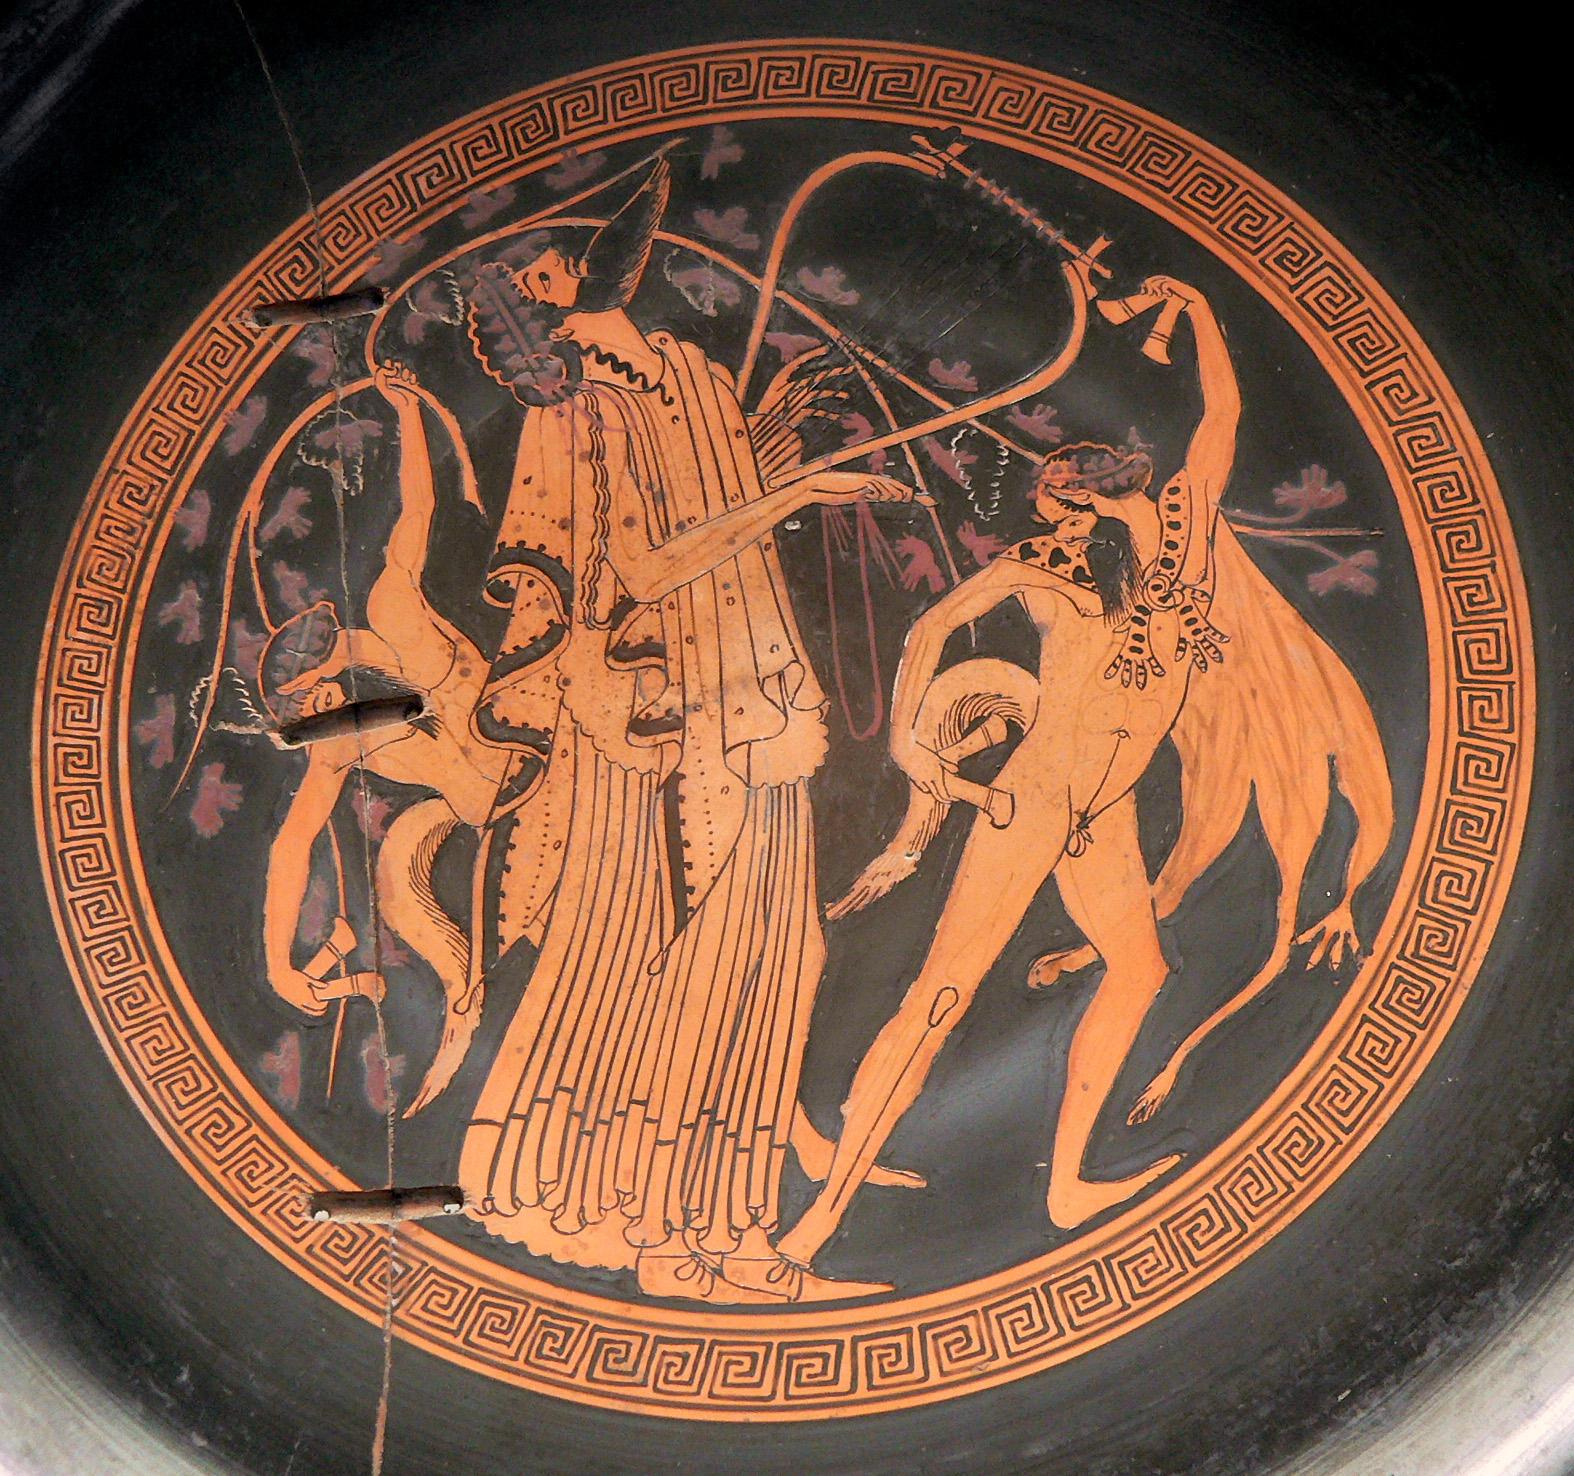 greek mythology and dionysus essay Essay on the holy bible - dionysus and genisis god - dionysus and genisis god greek mythology in death in venice by thomas mann - in this.